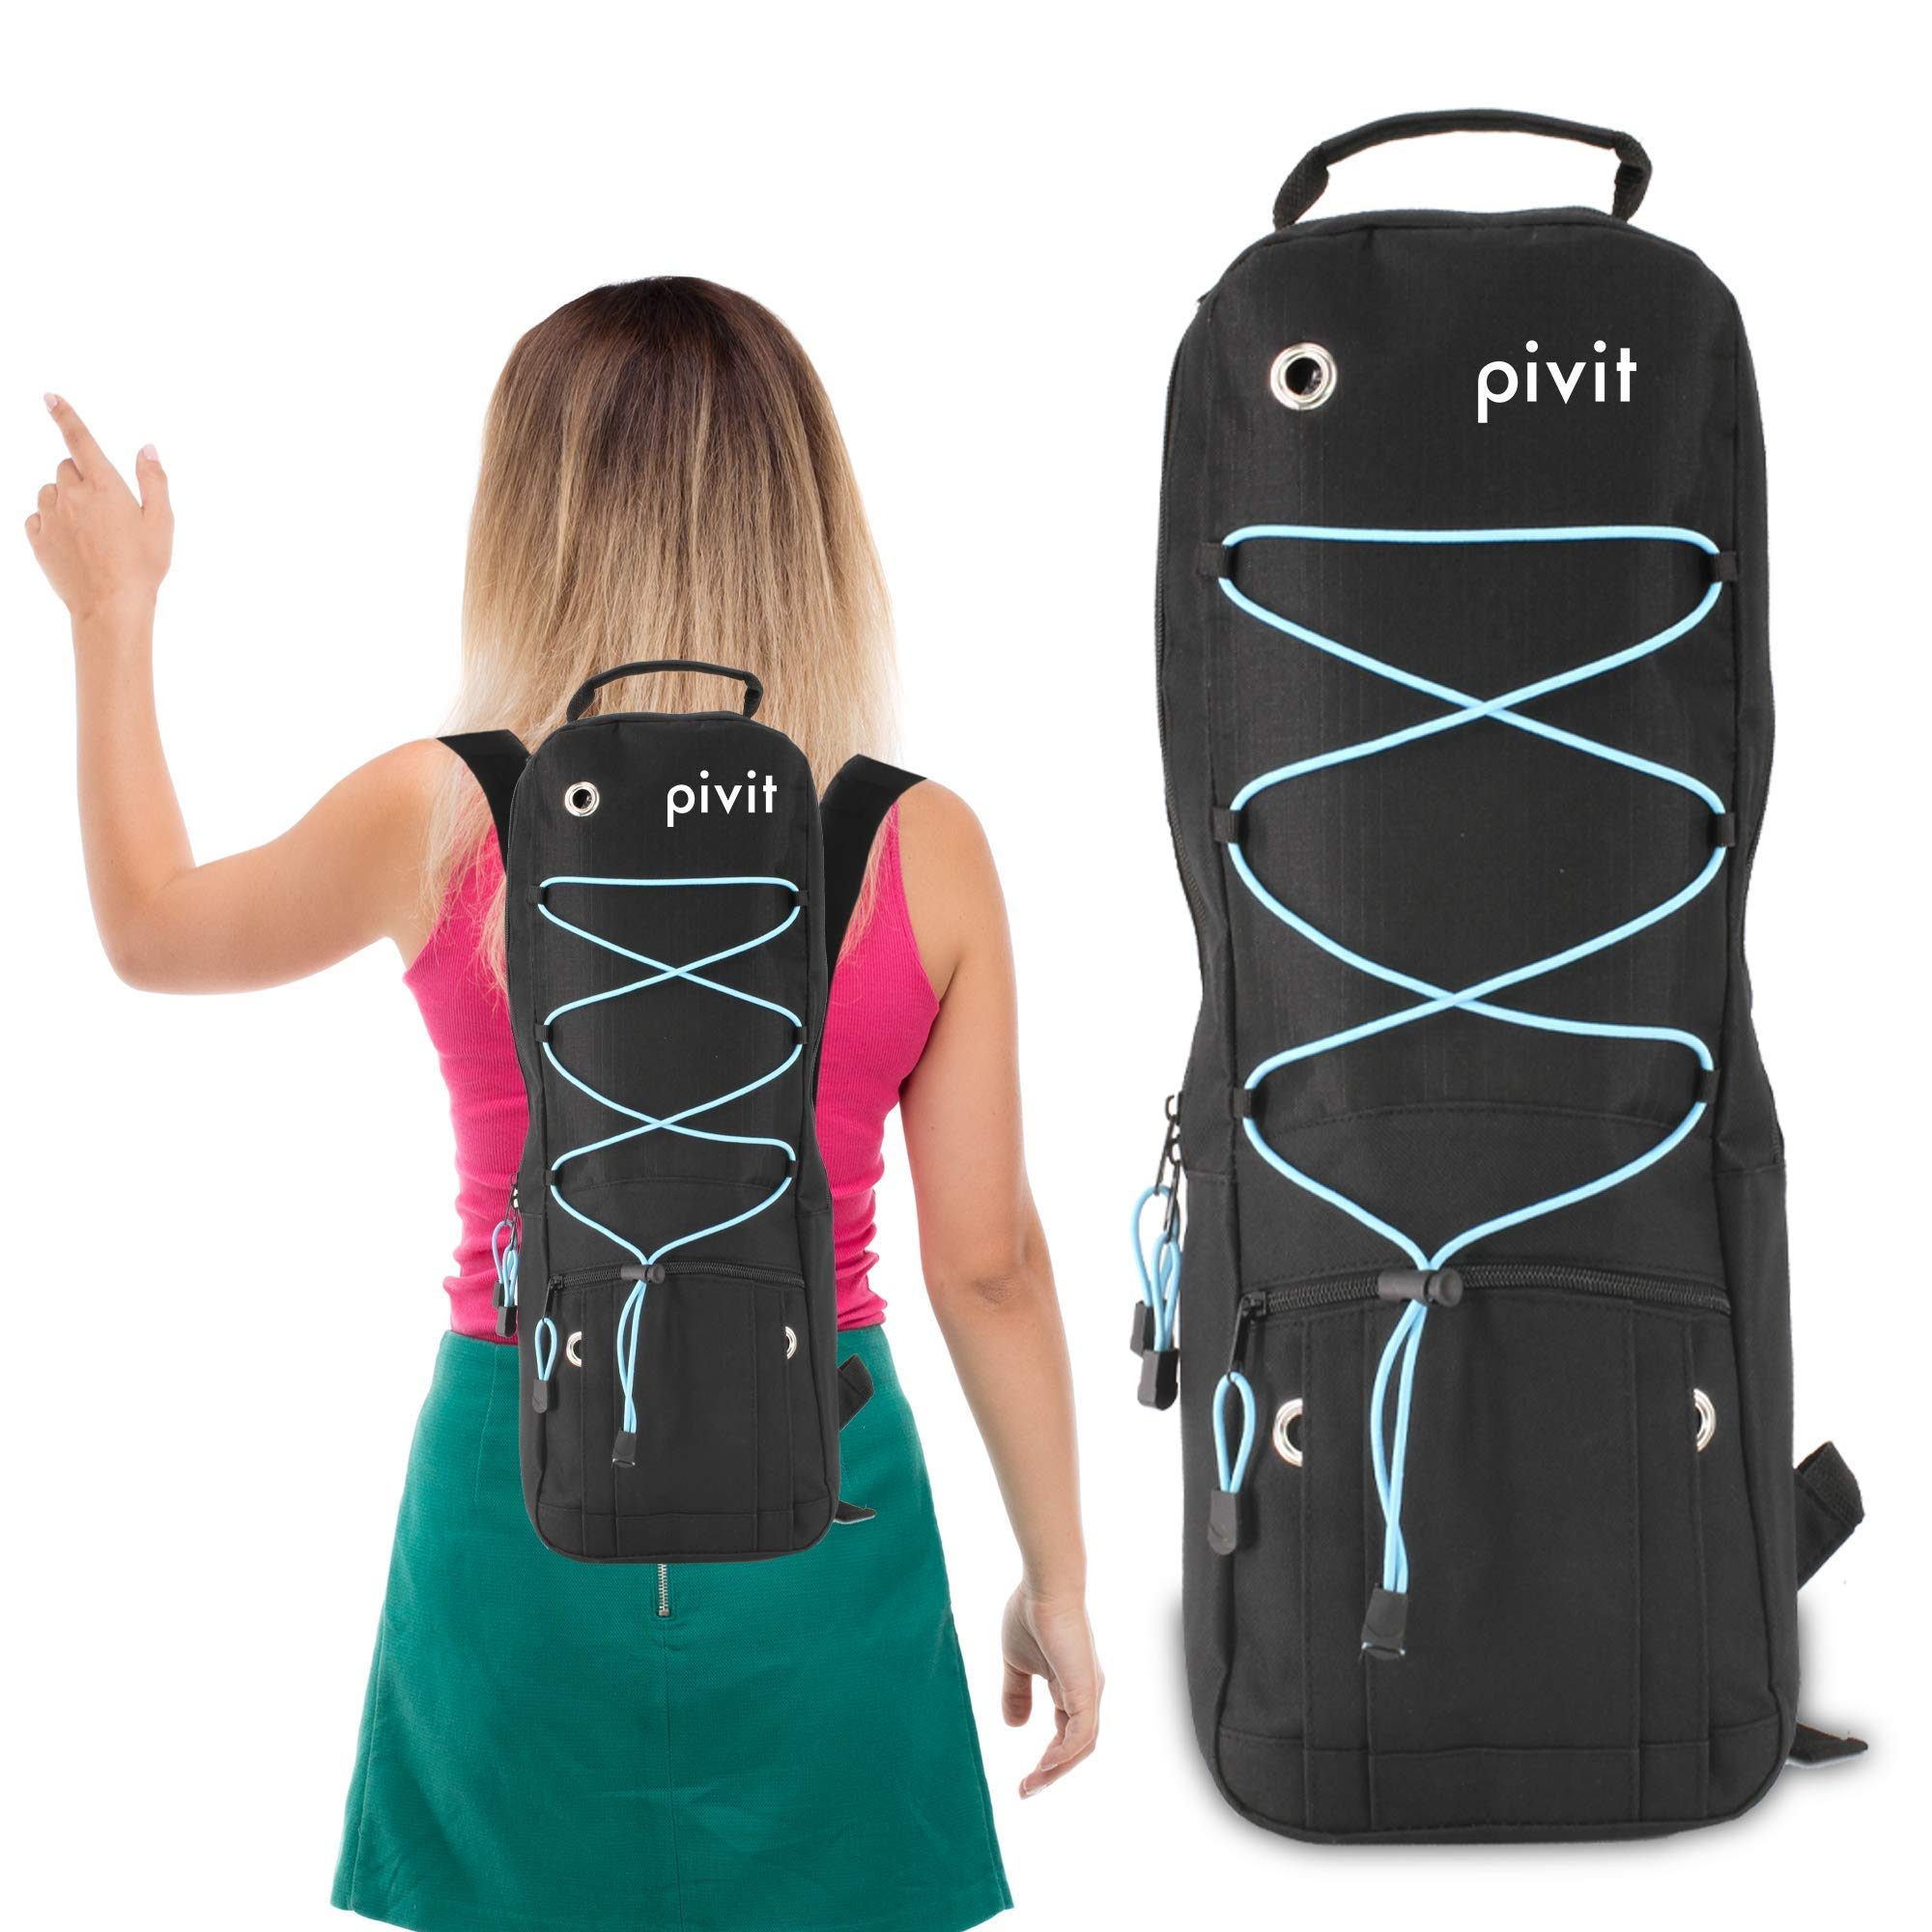 Pivit Oxygen Cylinder Tank Backpack | Fully Adjustable Carrying Accessories Bag for D Cylinders | Medical Holder Case for Wheelchair Shoulder Rollator Walker Scooter | Portable Travel Storage Carrier